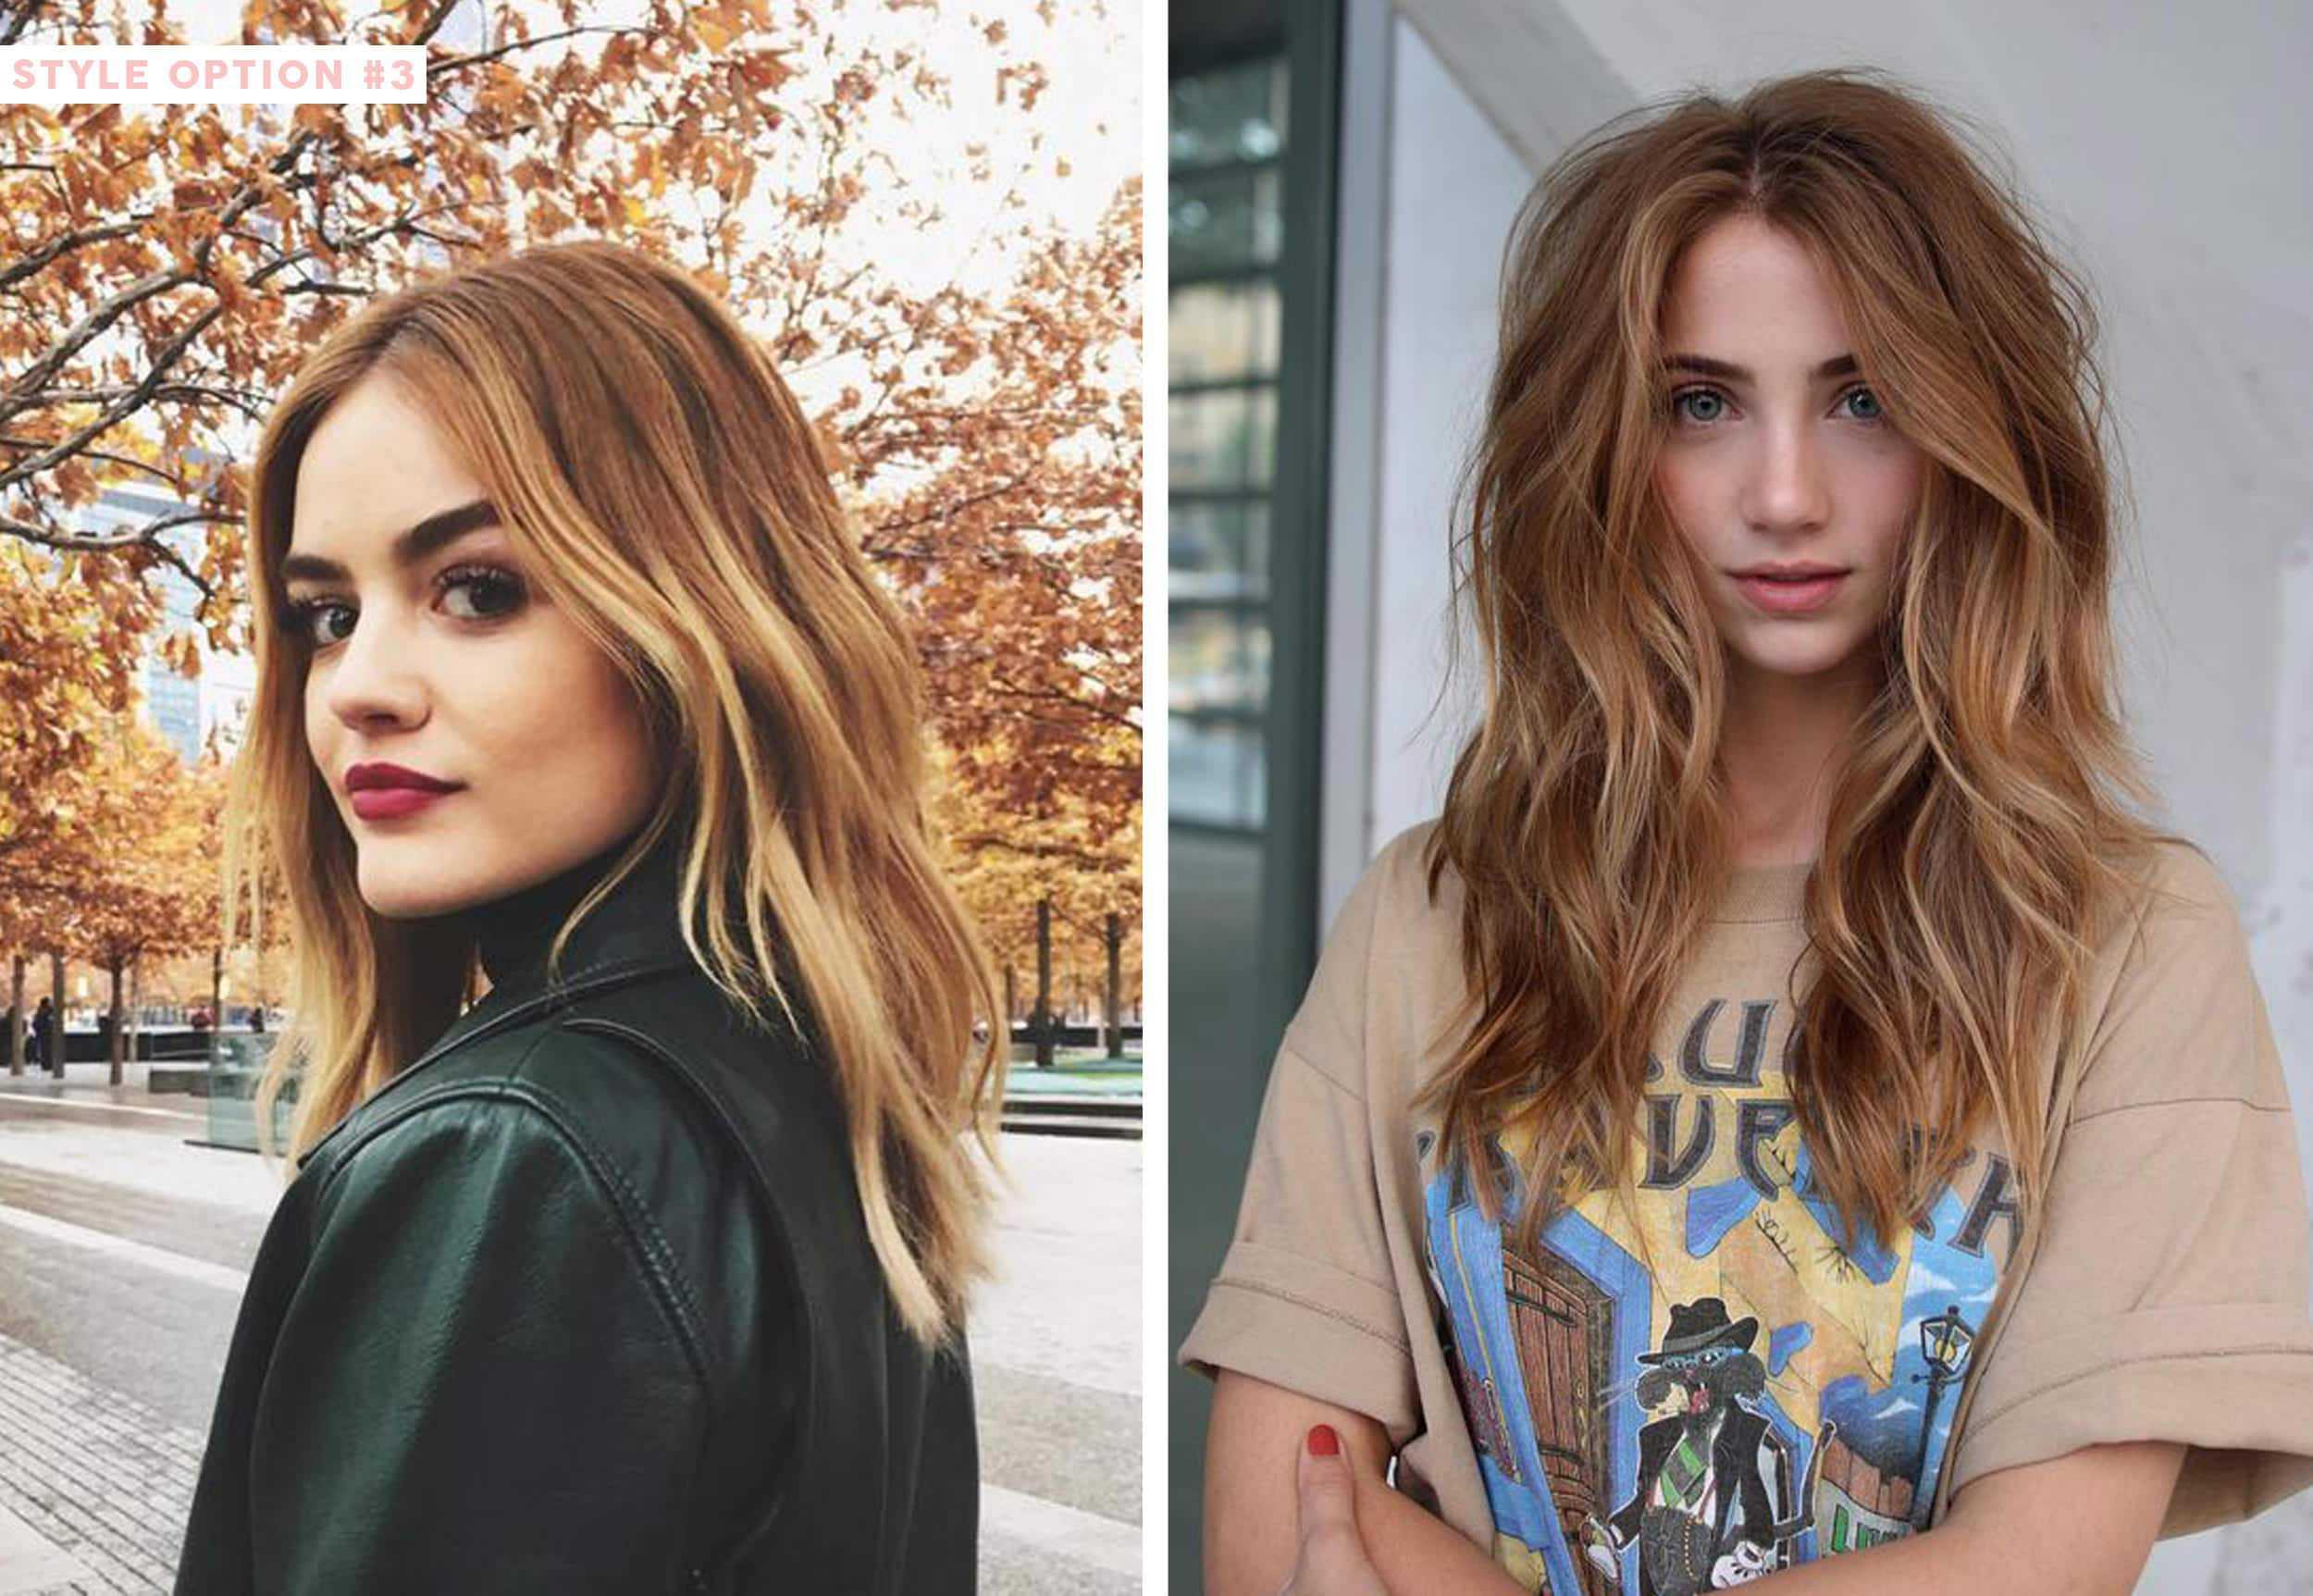 hairstyles 2018 female